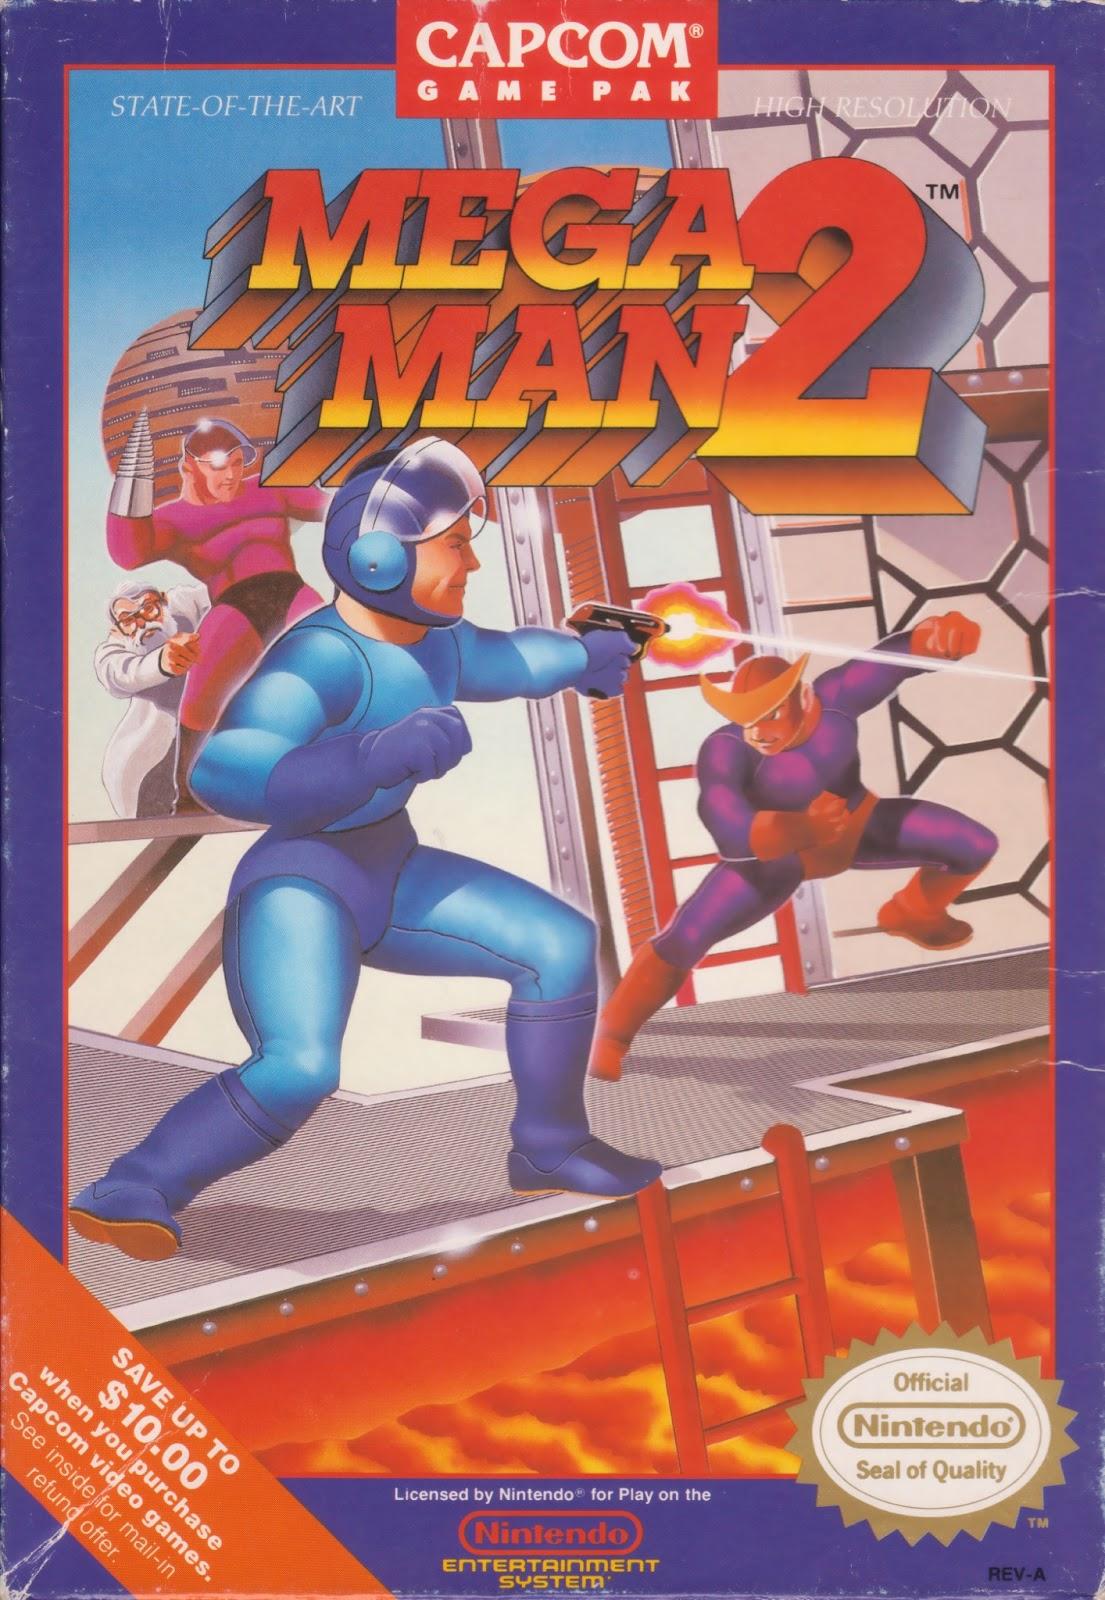 Rockman corner meet the man who drew mega man 2 39 s box art for Megaman 9 portada